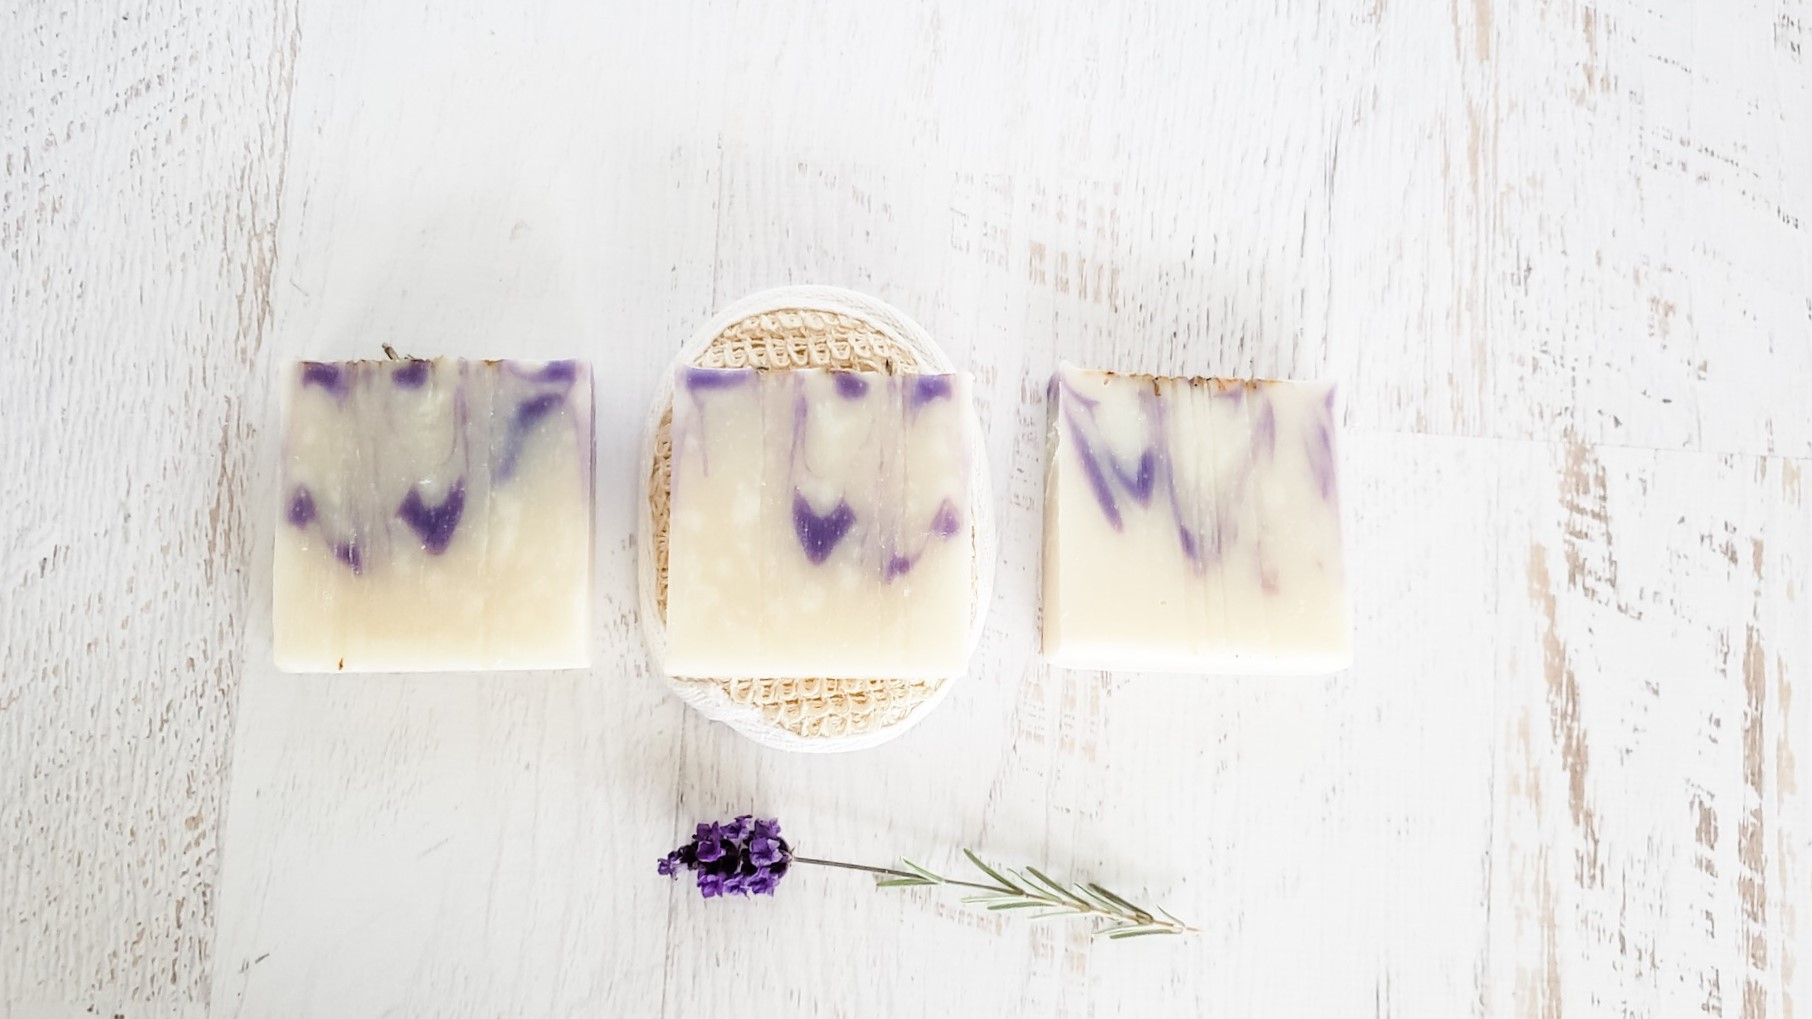 Three bars of lavender soap